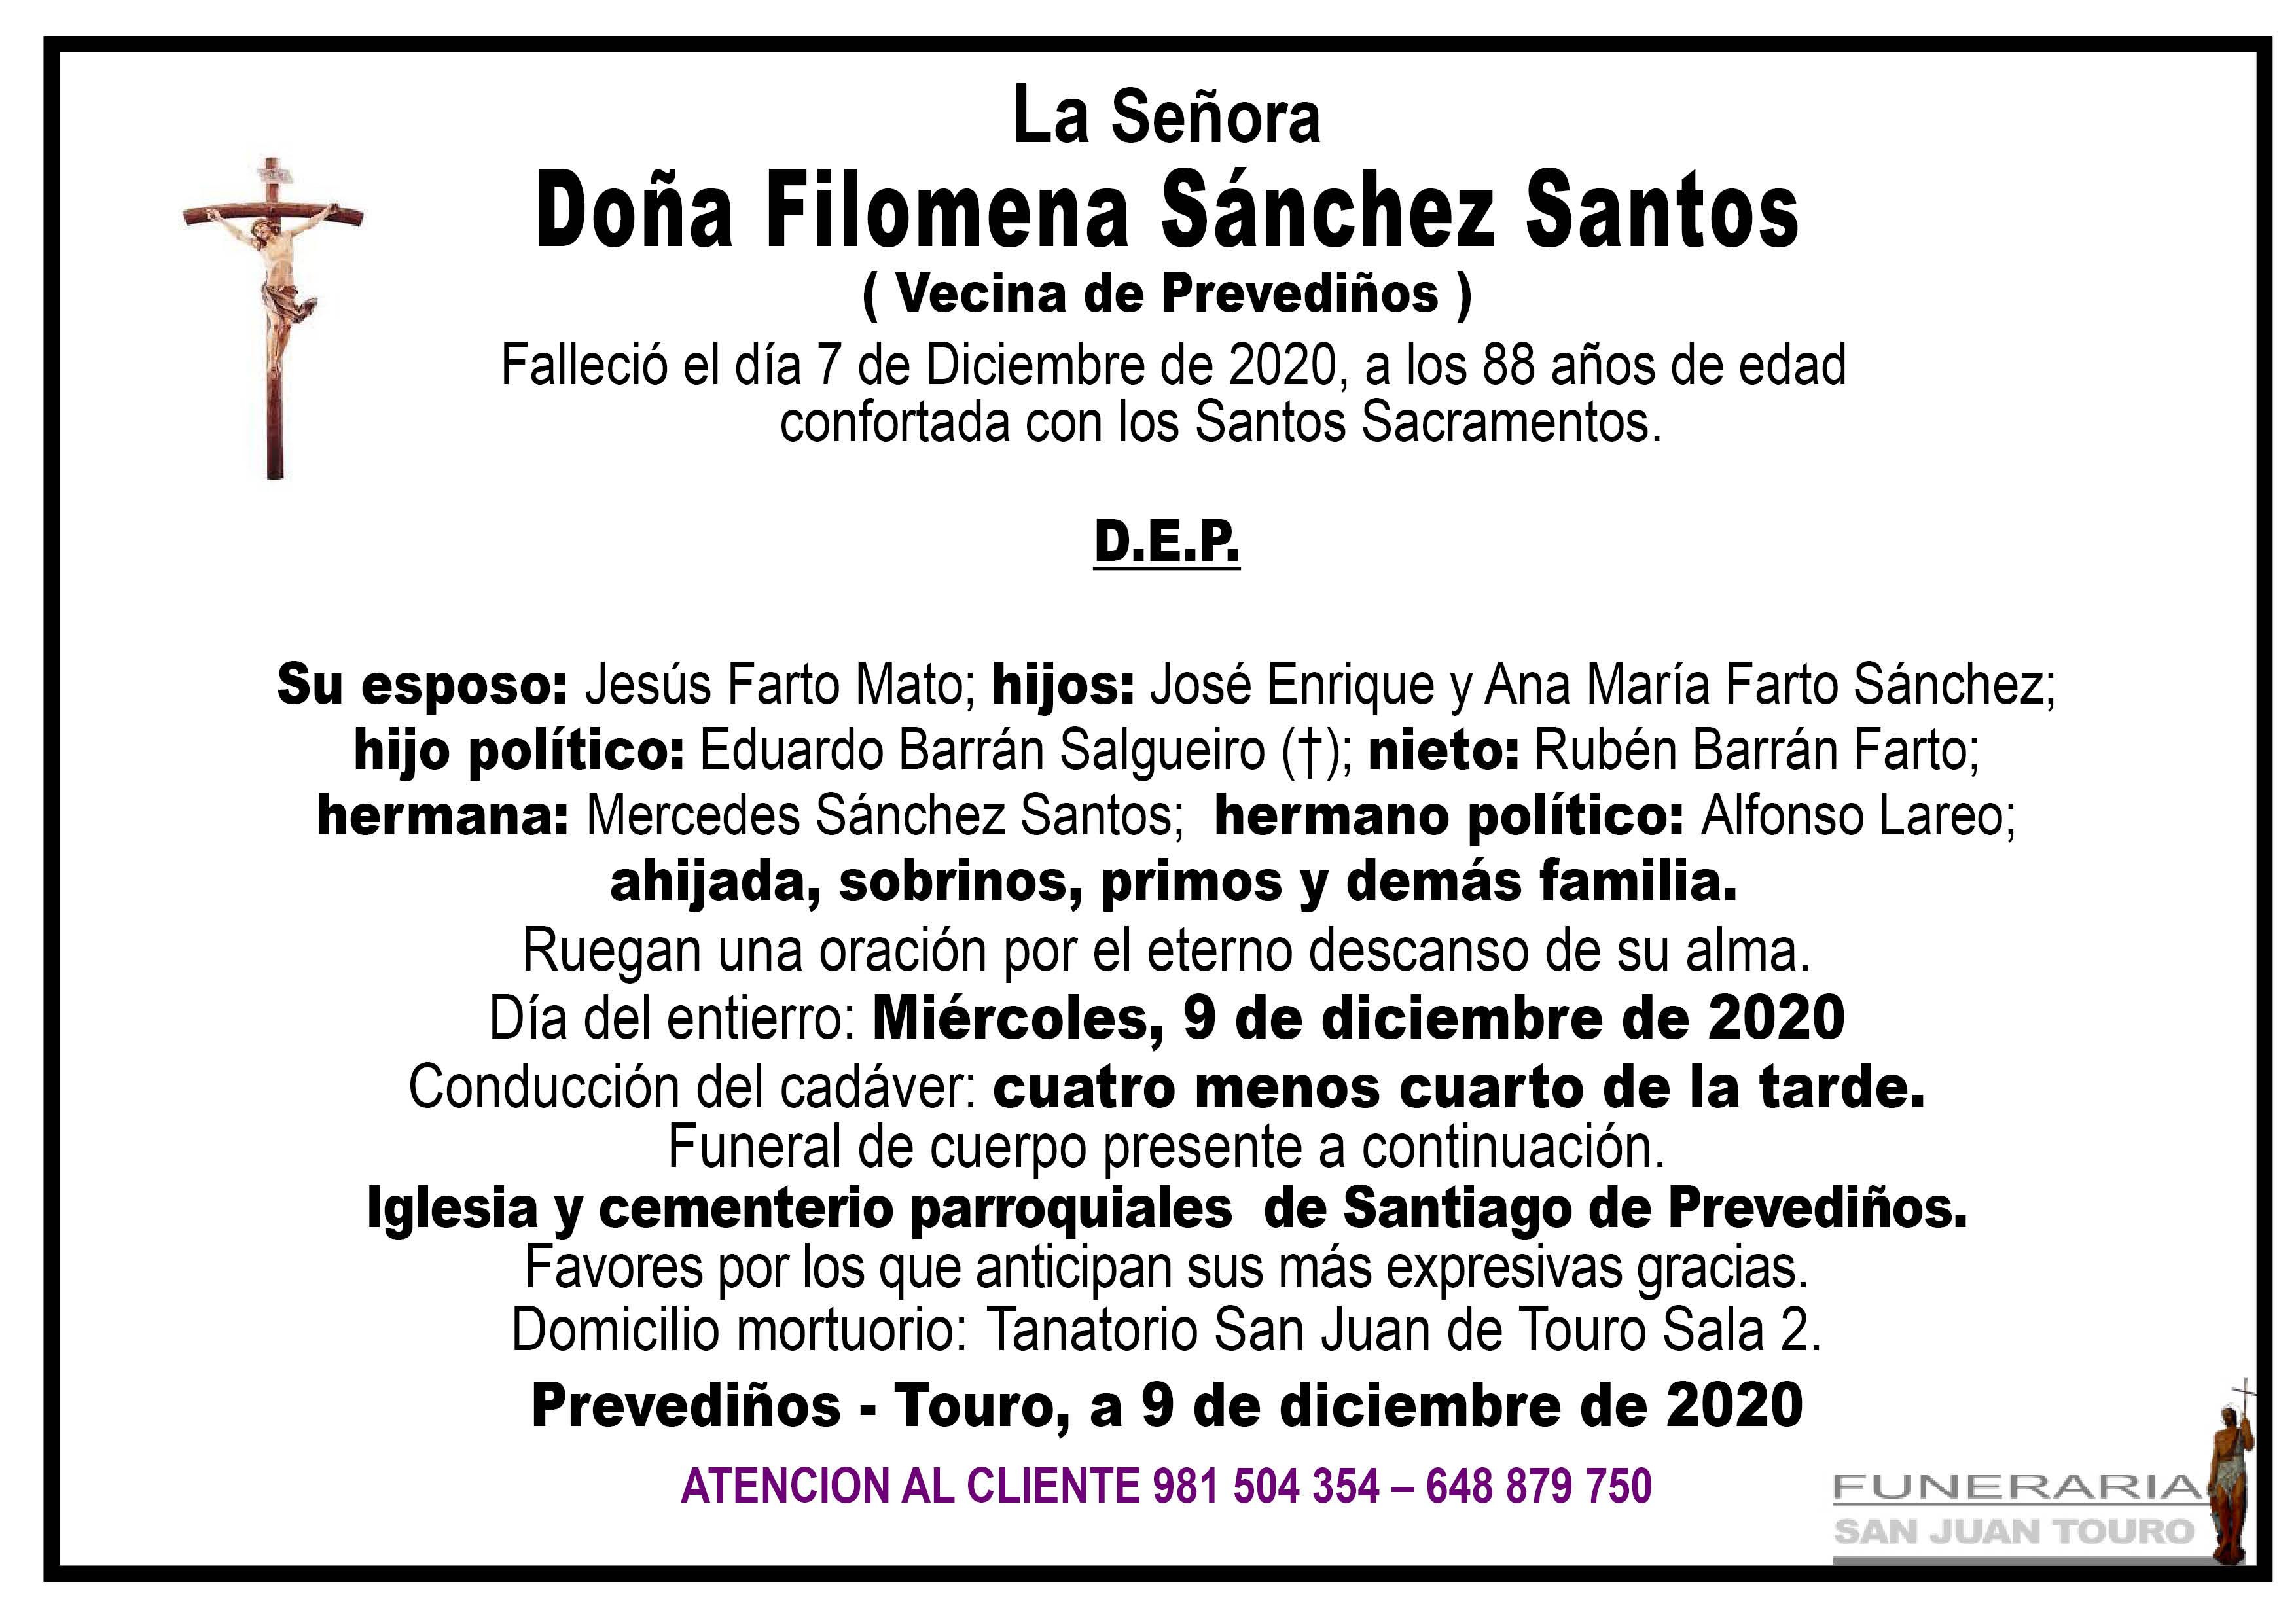 Esquela de SEPELIO DE DOÑA FILOMENA SÁNCHEZ SANTOS